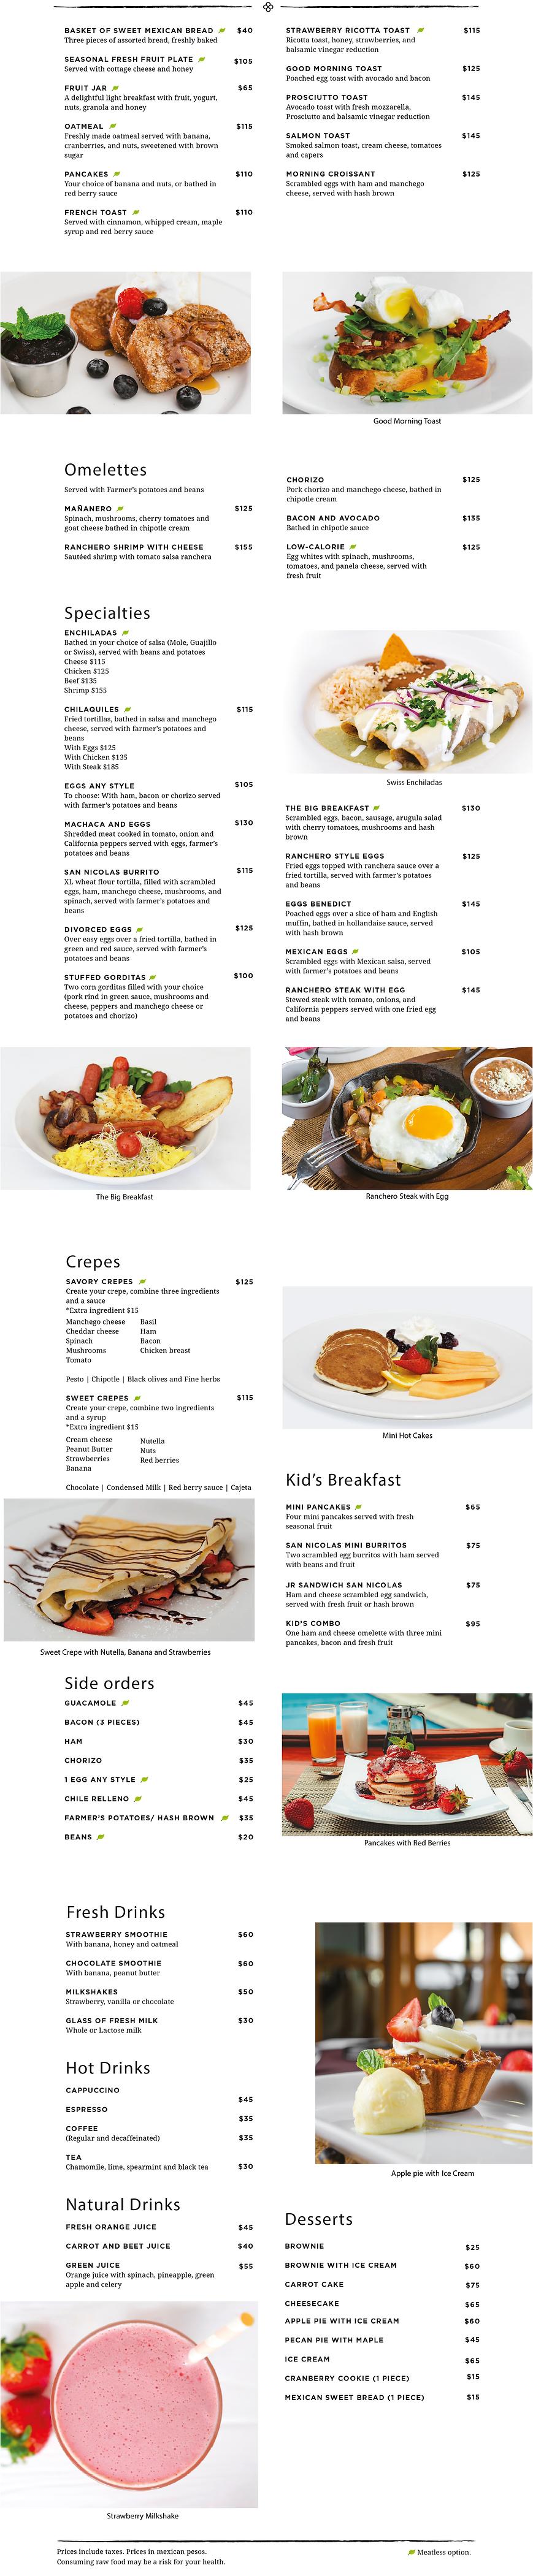 breakfasts web.png